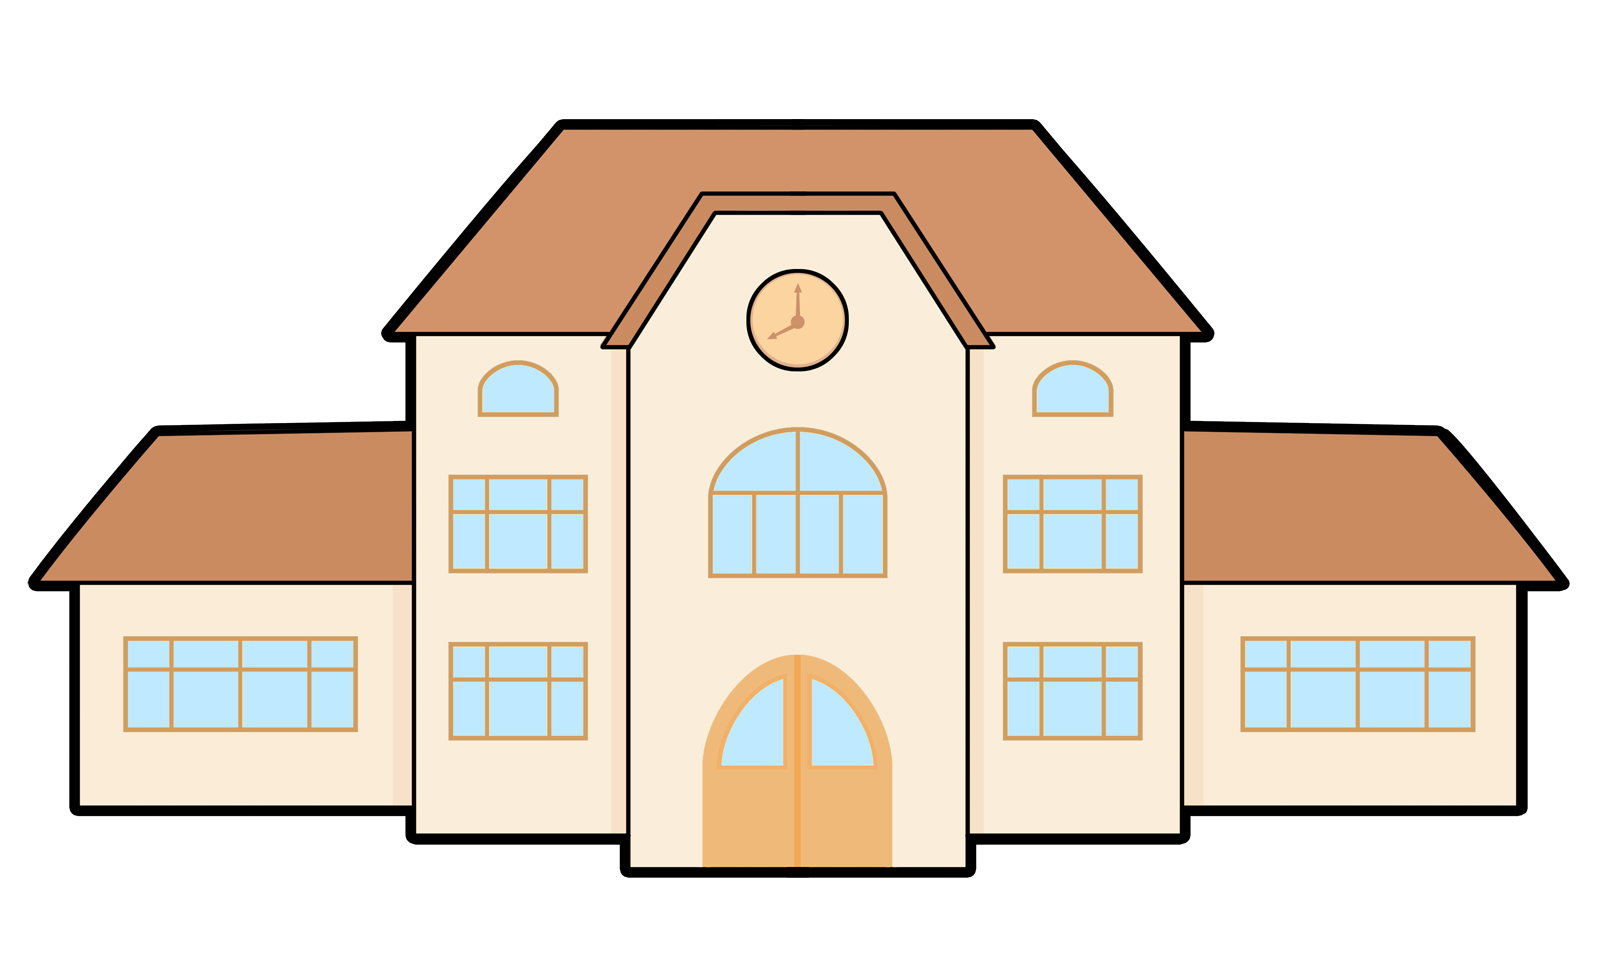 Free Cartoon School Building Clip Art